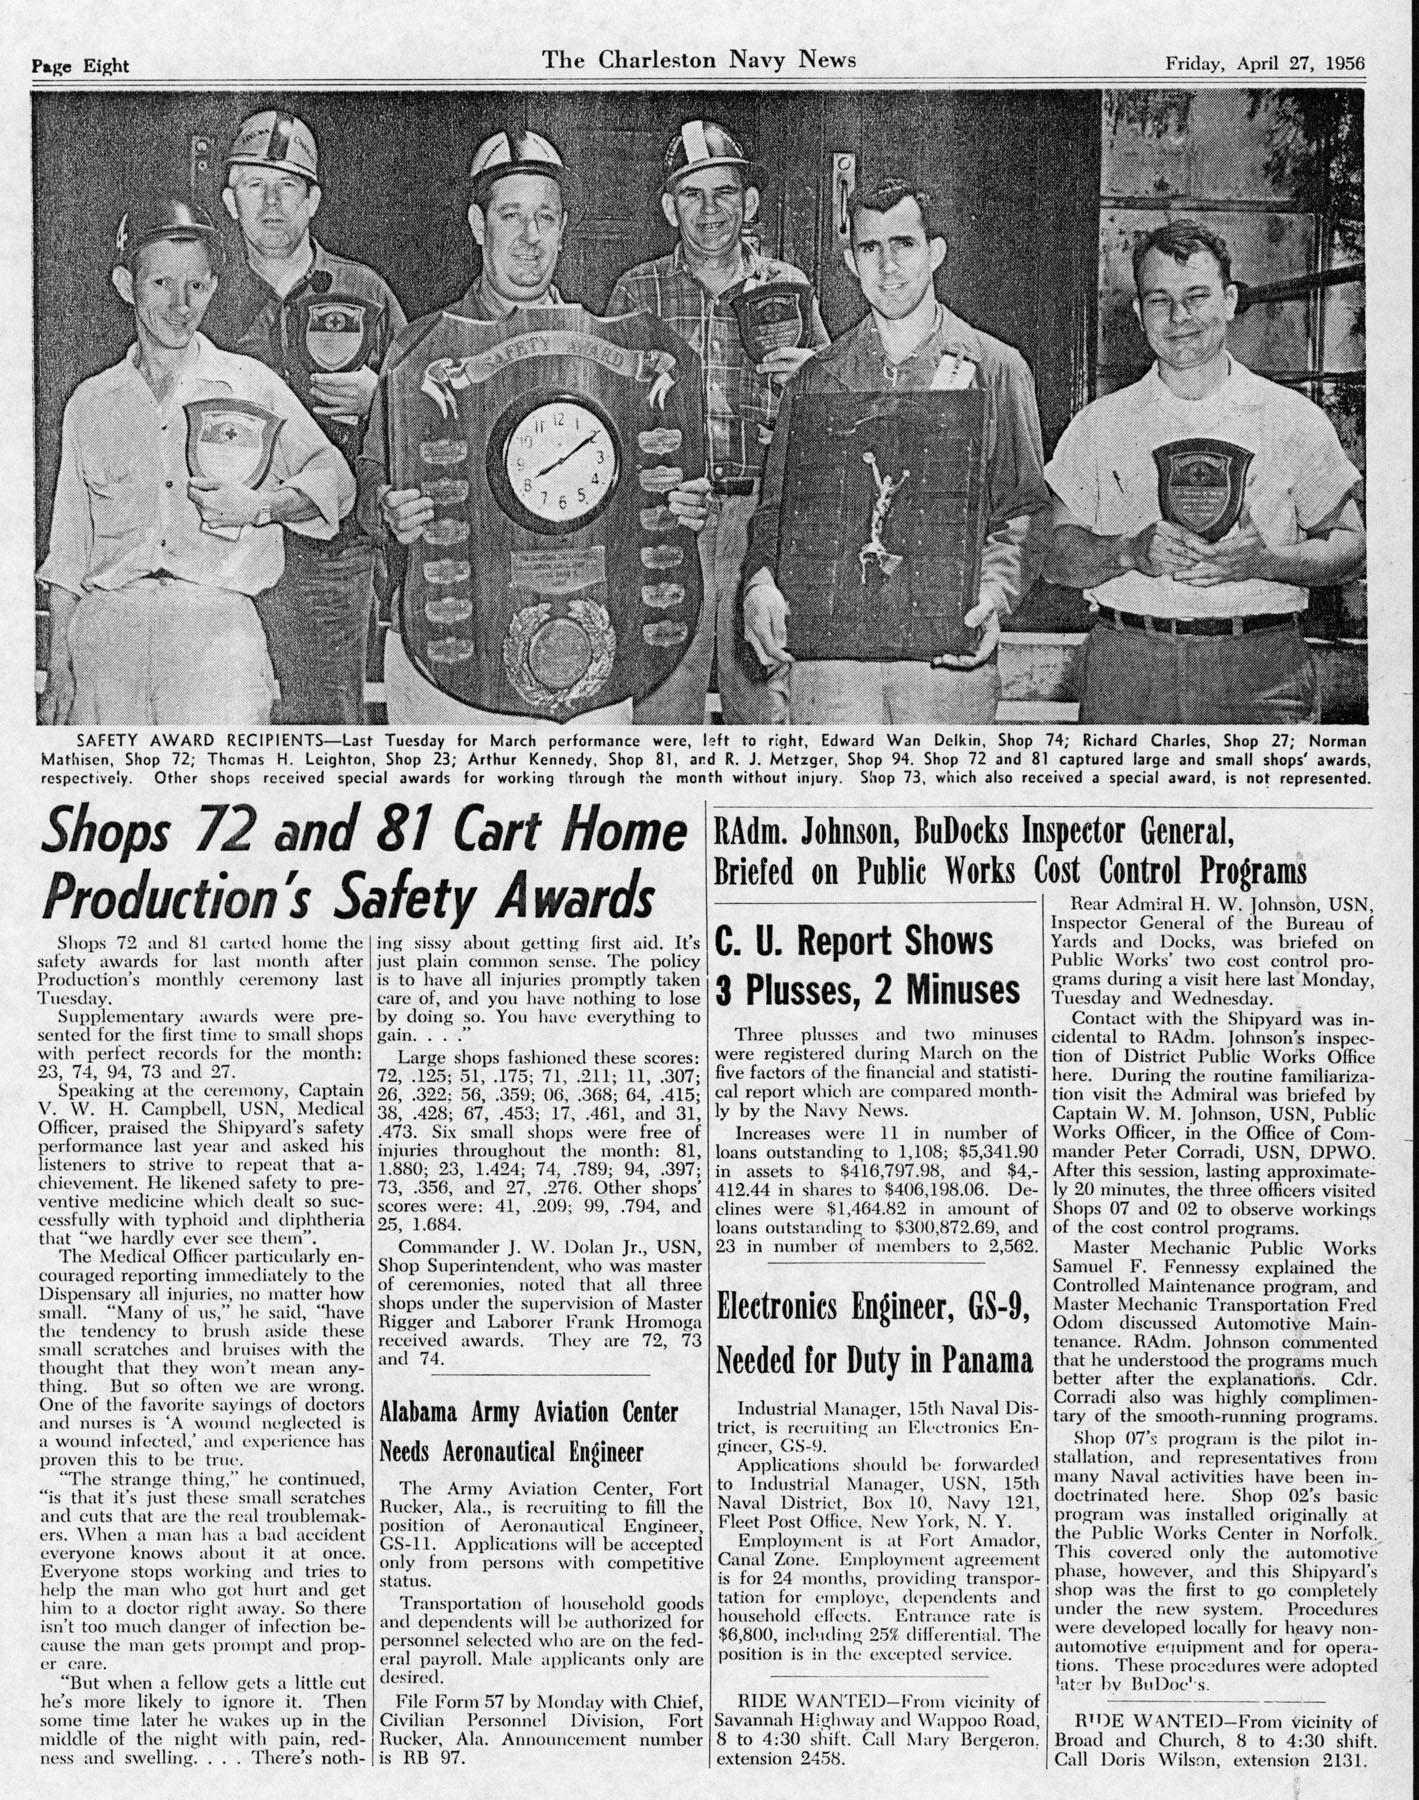 The Charleston Navy News, Volume 14, Edition 20, page viii